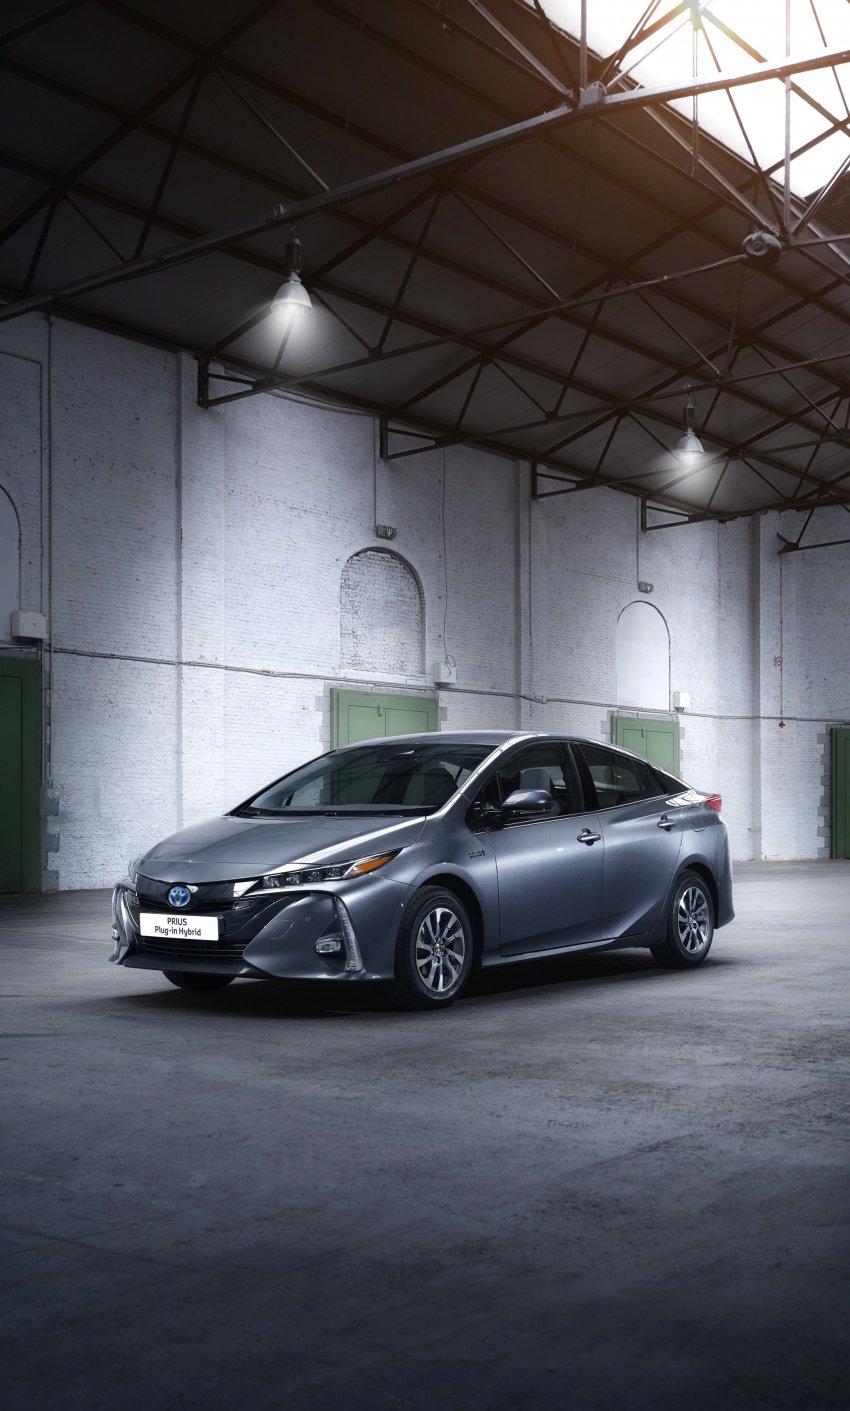 New Toyota Prius Plug-in Hybrid – double the EV range Image #612843